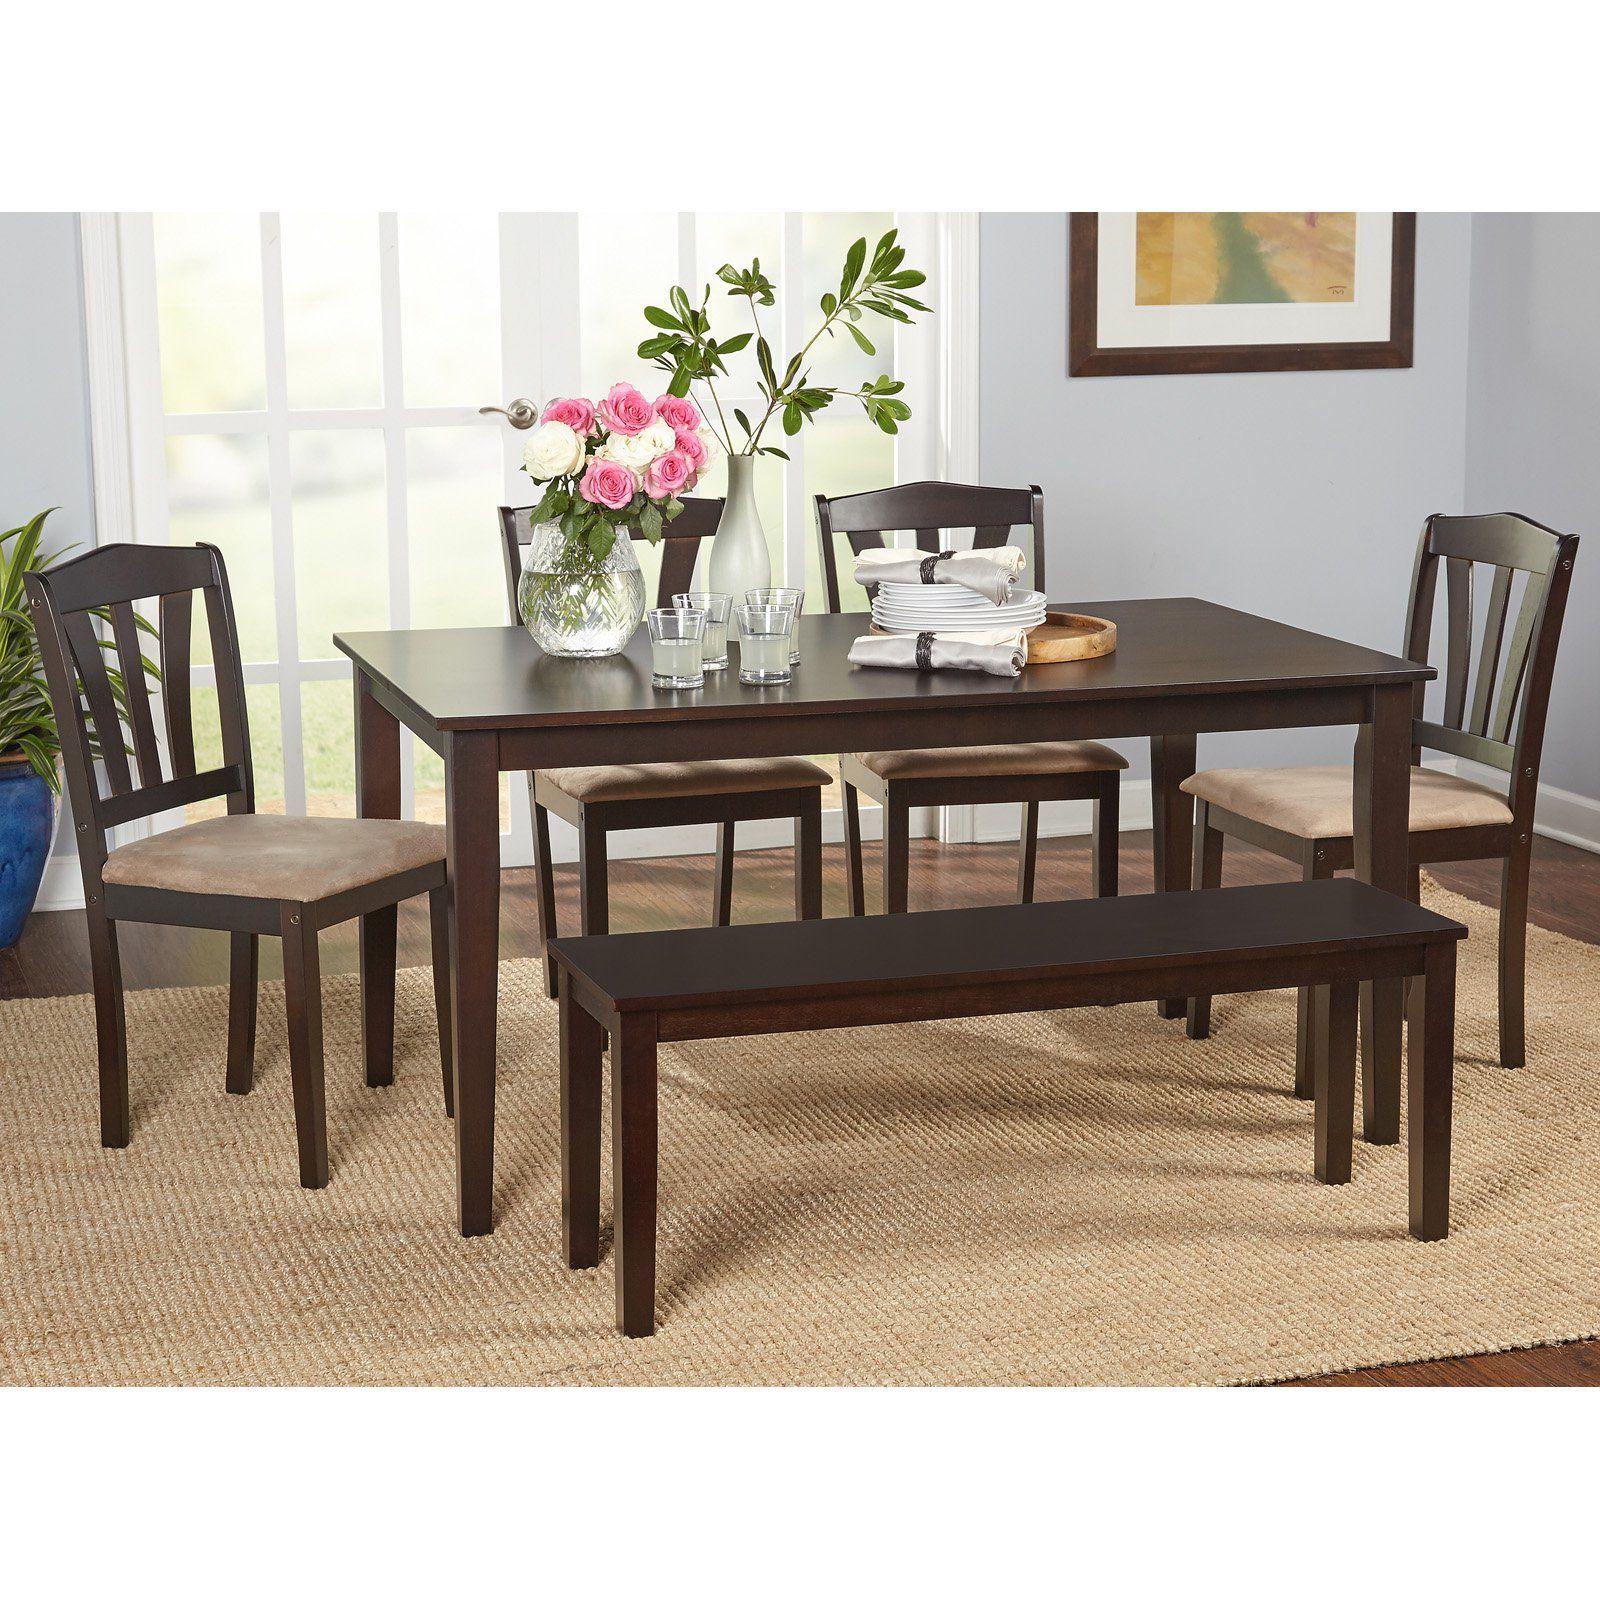 Target Marketing Systems Metropolitan 6 Piece Dining Table Set